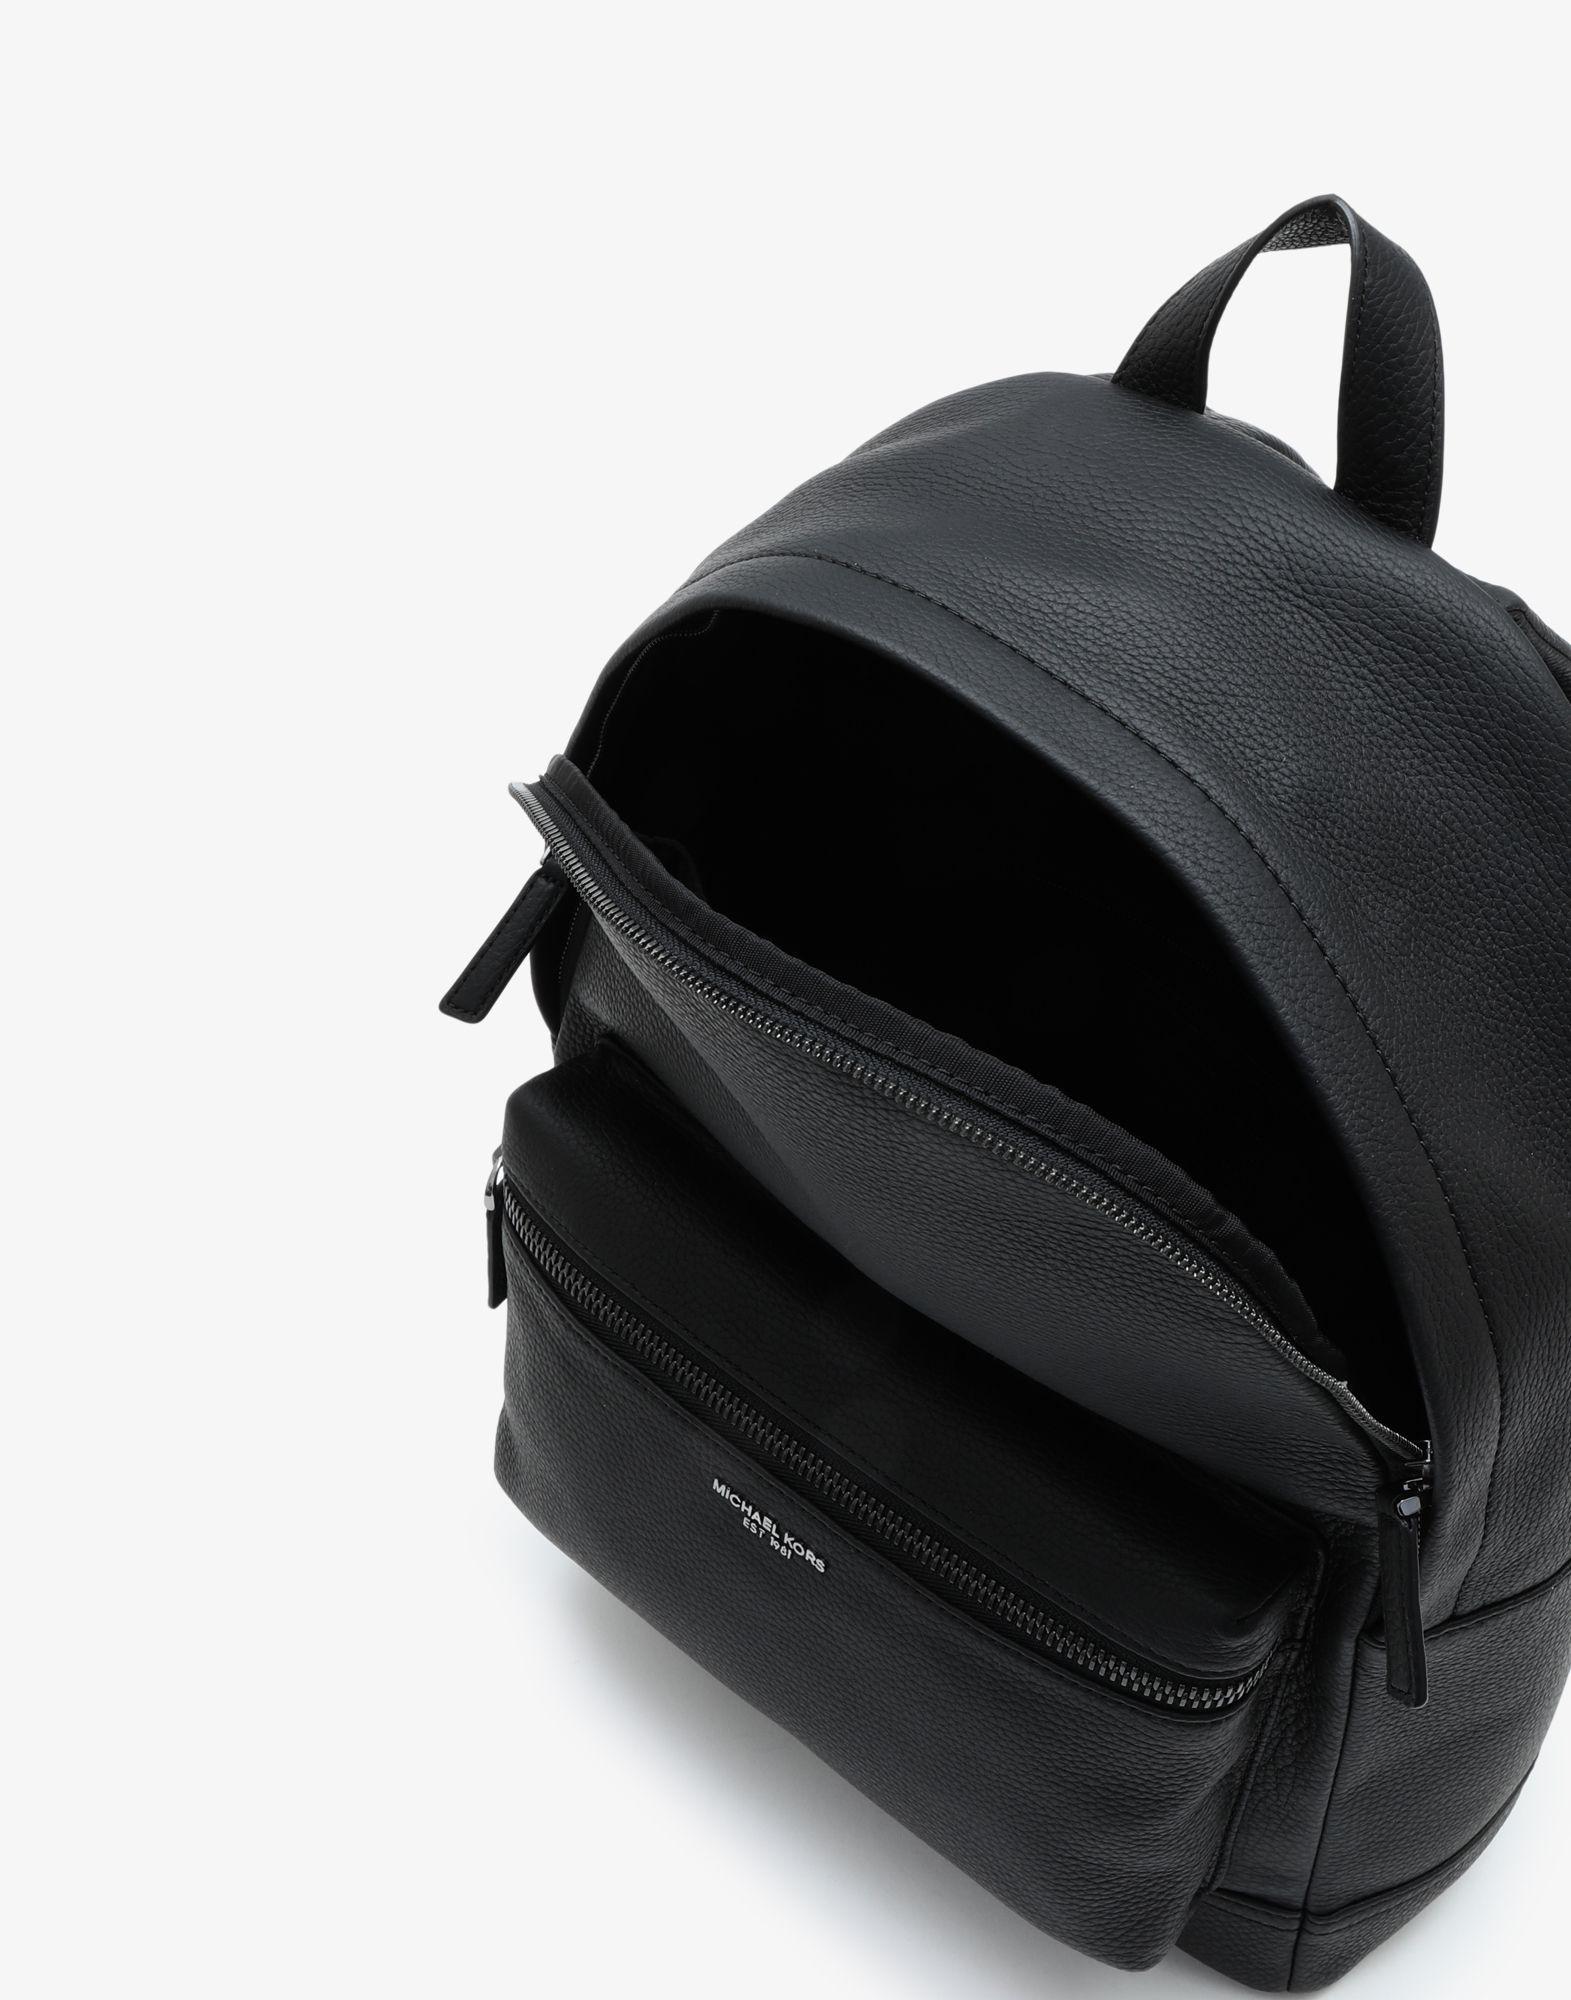 49237a2f717d Michael Kors Backpacks   Bum Bags in Black for Men - Lyst